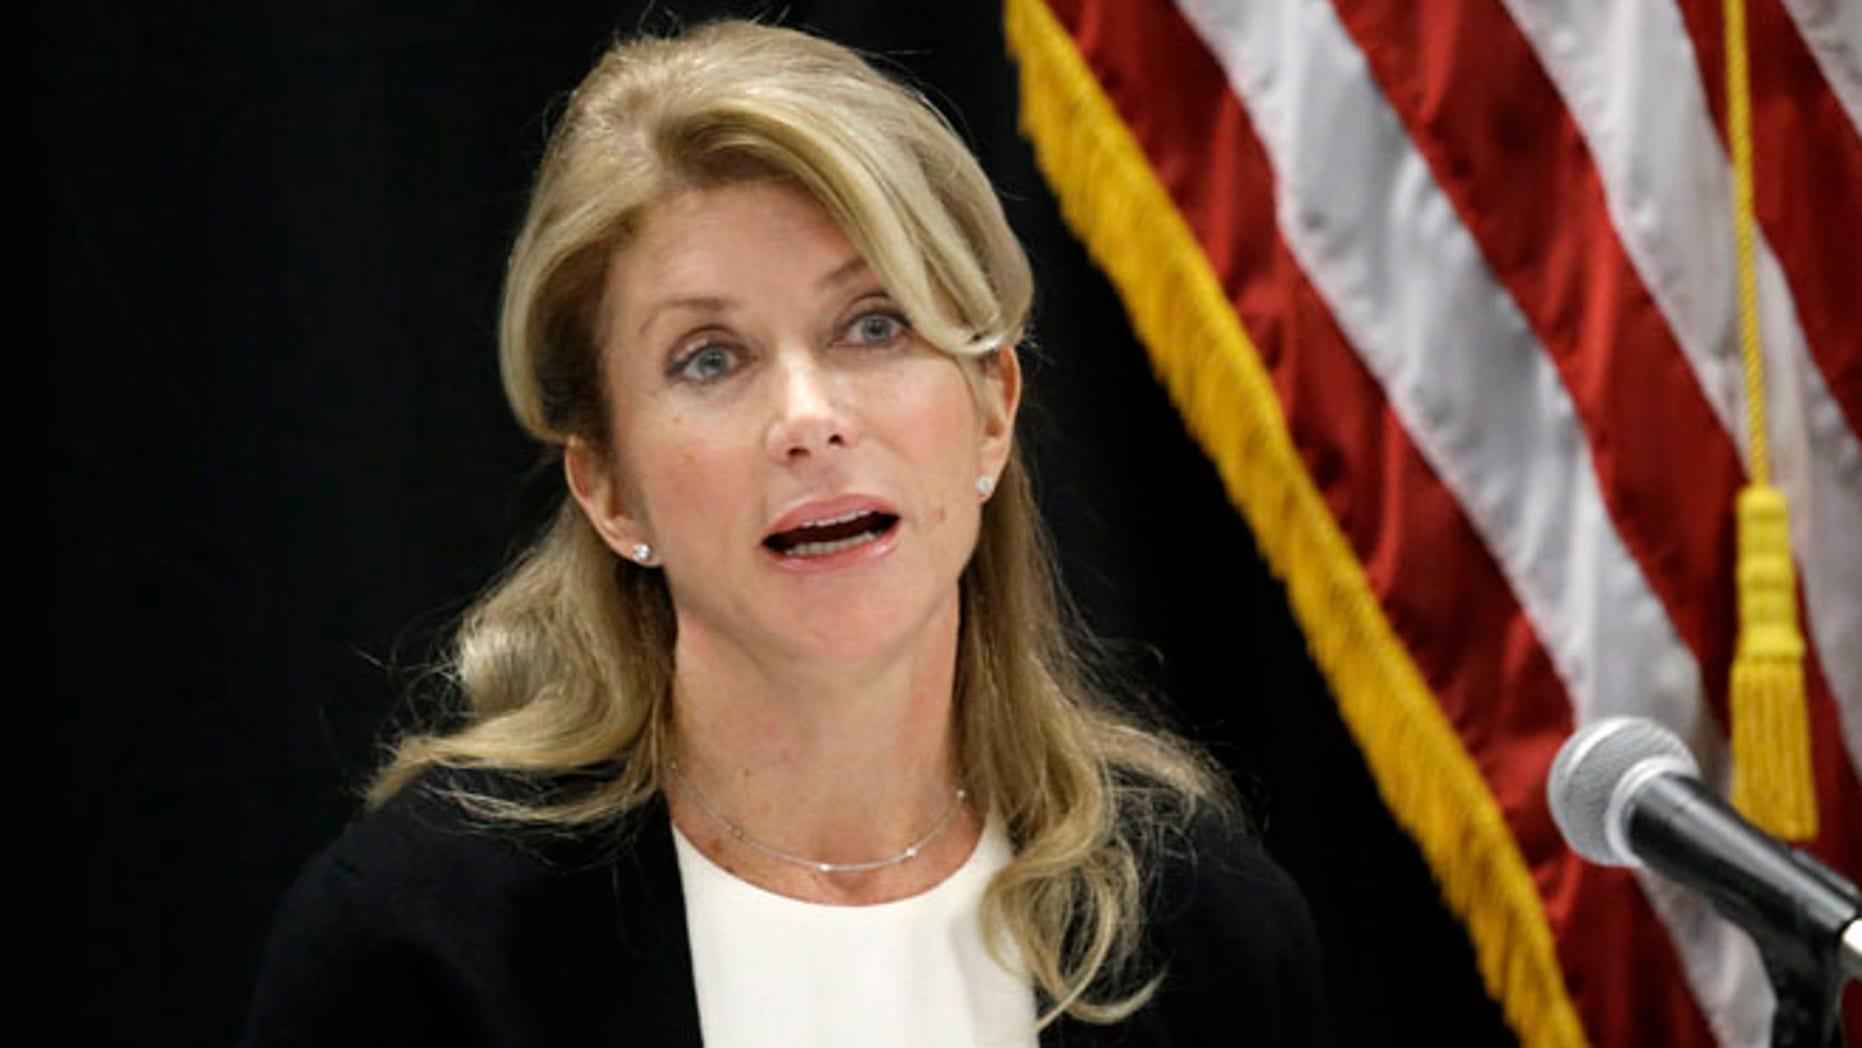 Jan. 9, 2014: Texas state Sen. Wendy Davis speaks at an education roundtable meeting in Arlington, Texas.